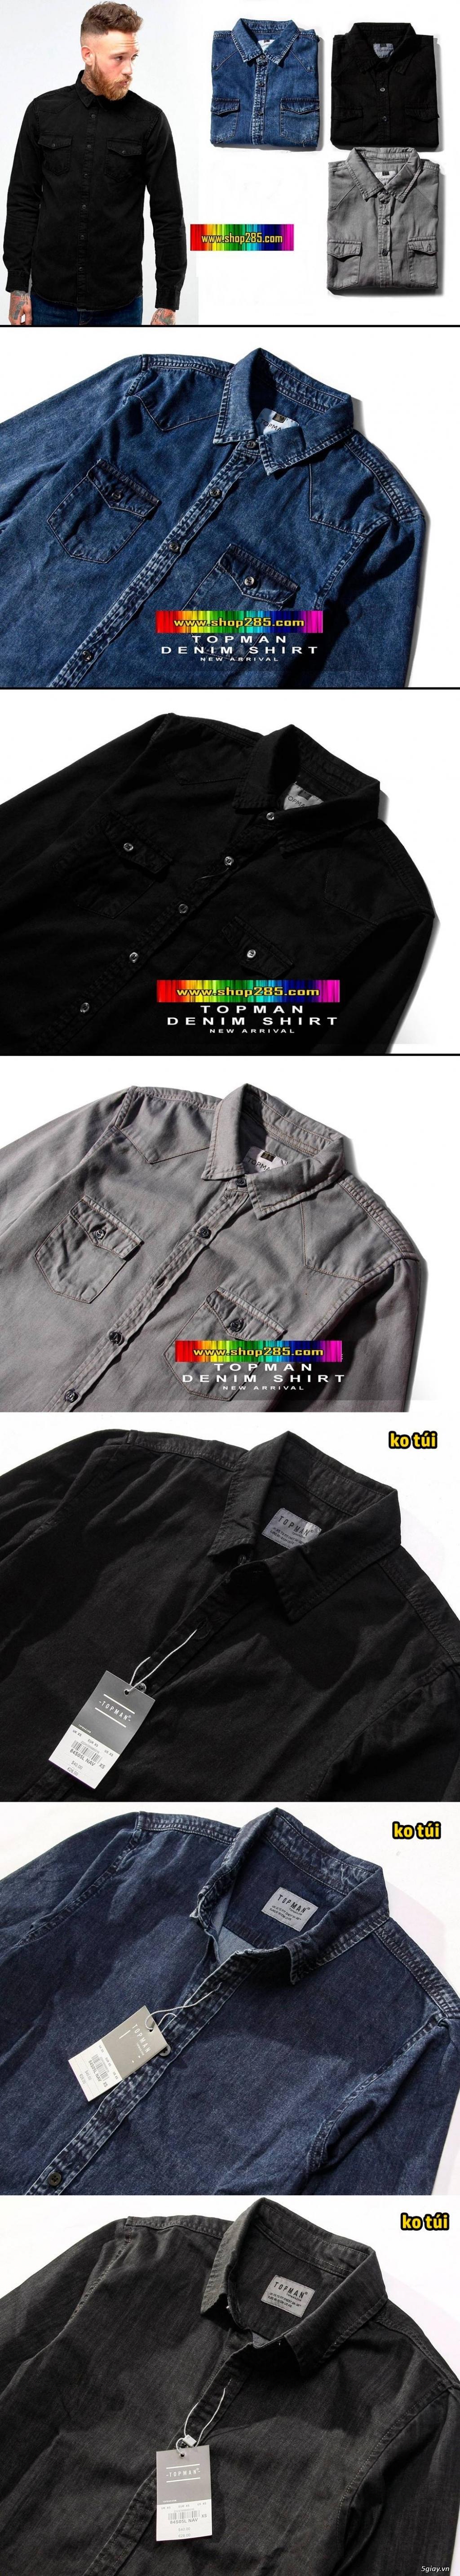 Shop285.com - Shop quần áo : Zara,Jules,Jake*s,,Hollister,Aber,CK,Tommy,Levis - 9